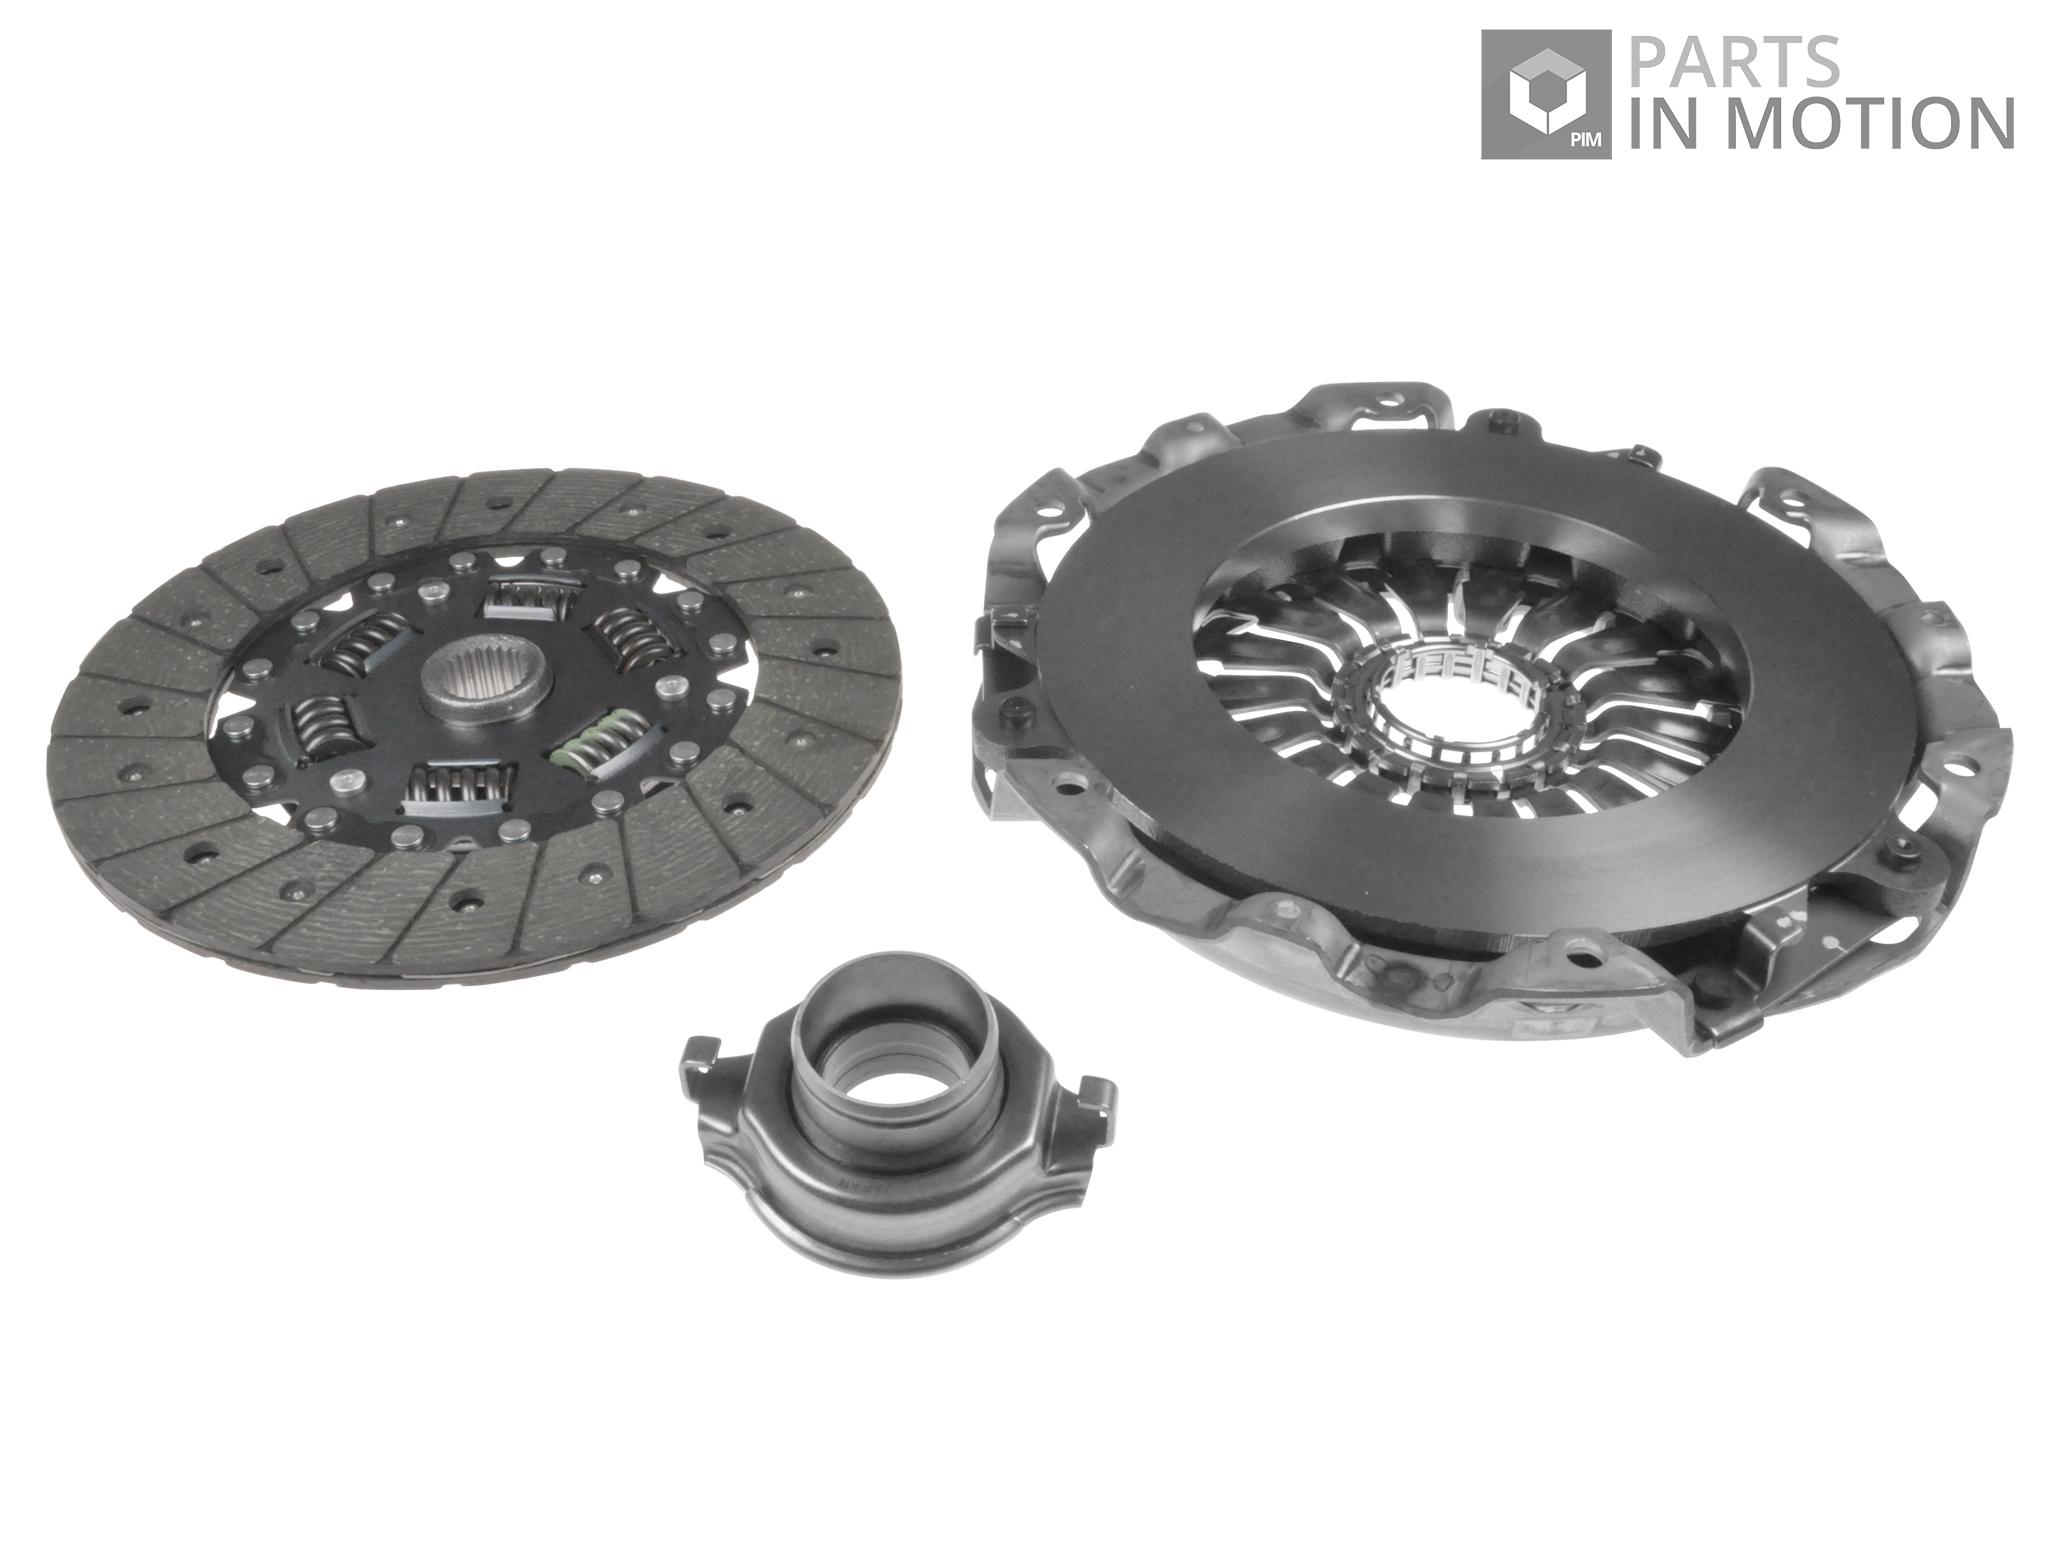 Clutch kit Fits Subaru Impreza GF 2.0 96 To 00 230 mm ADL 30100AA900S1 Qualité